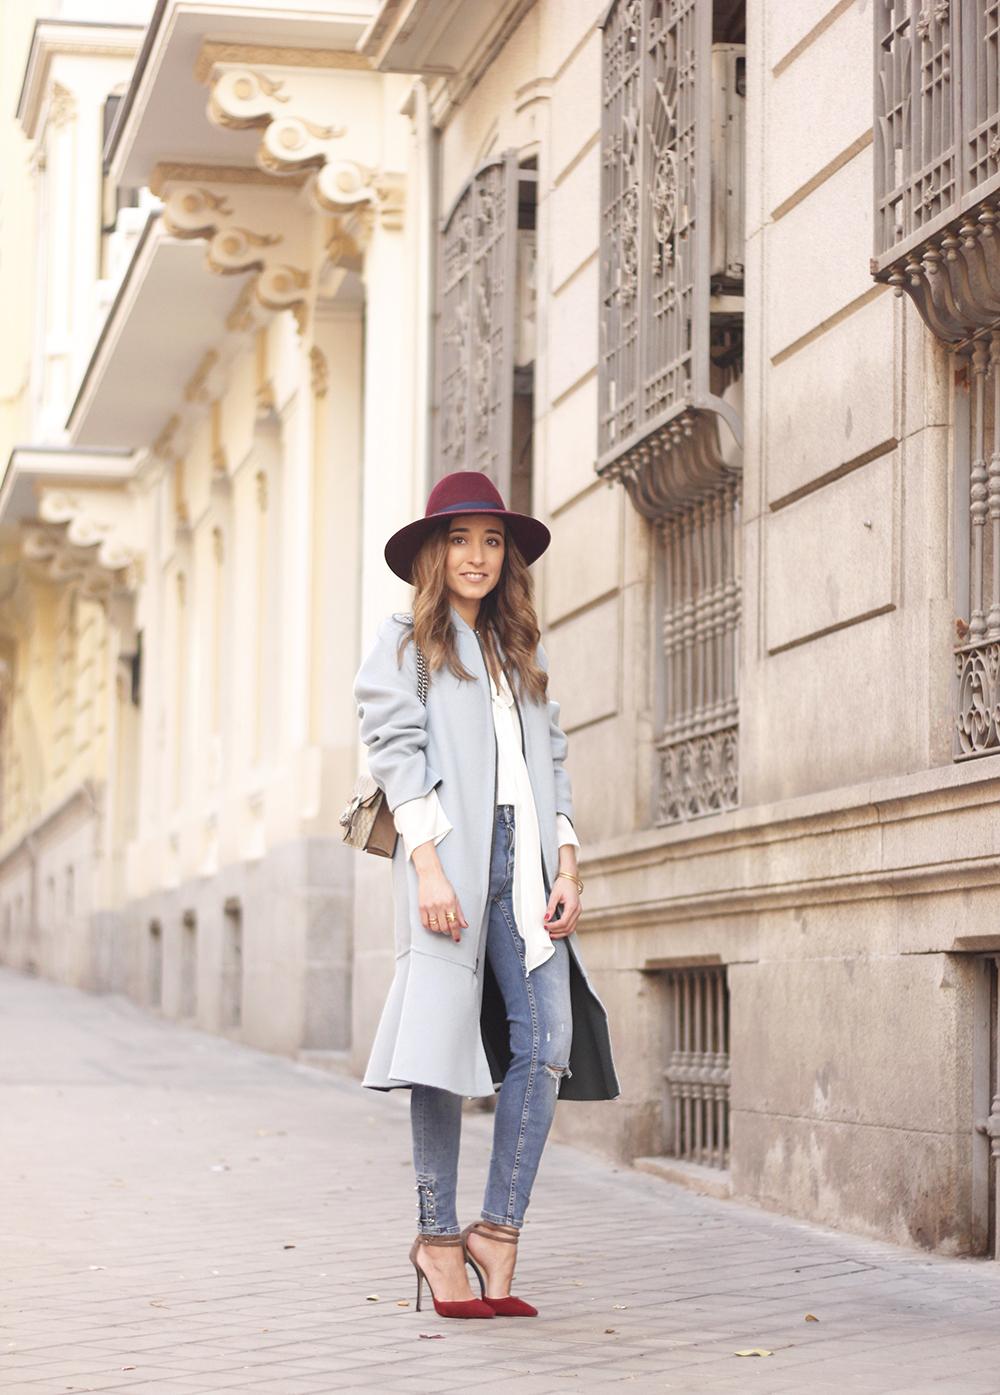 blue coat uterqüe abrigo azul gucci bag burgundy heels winter outfit street style fashion02